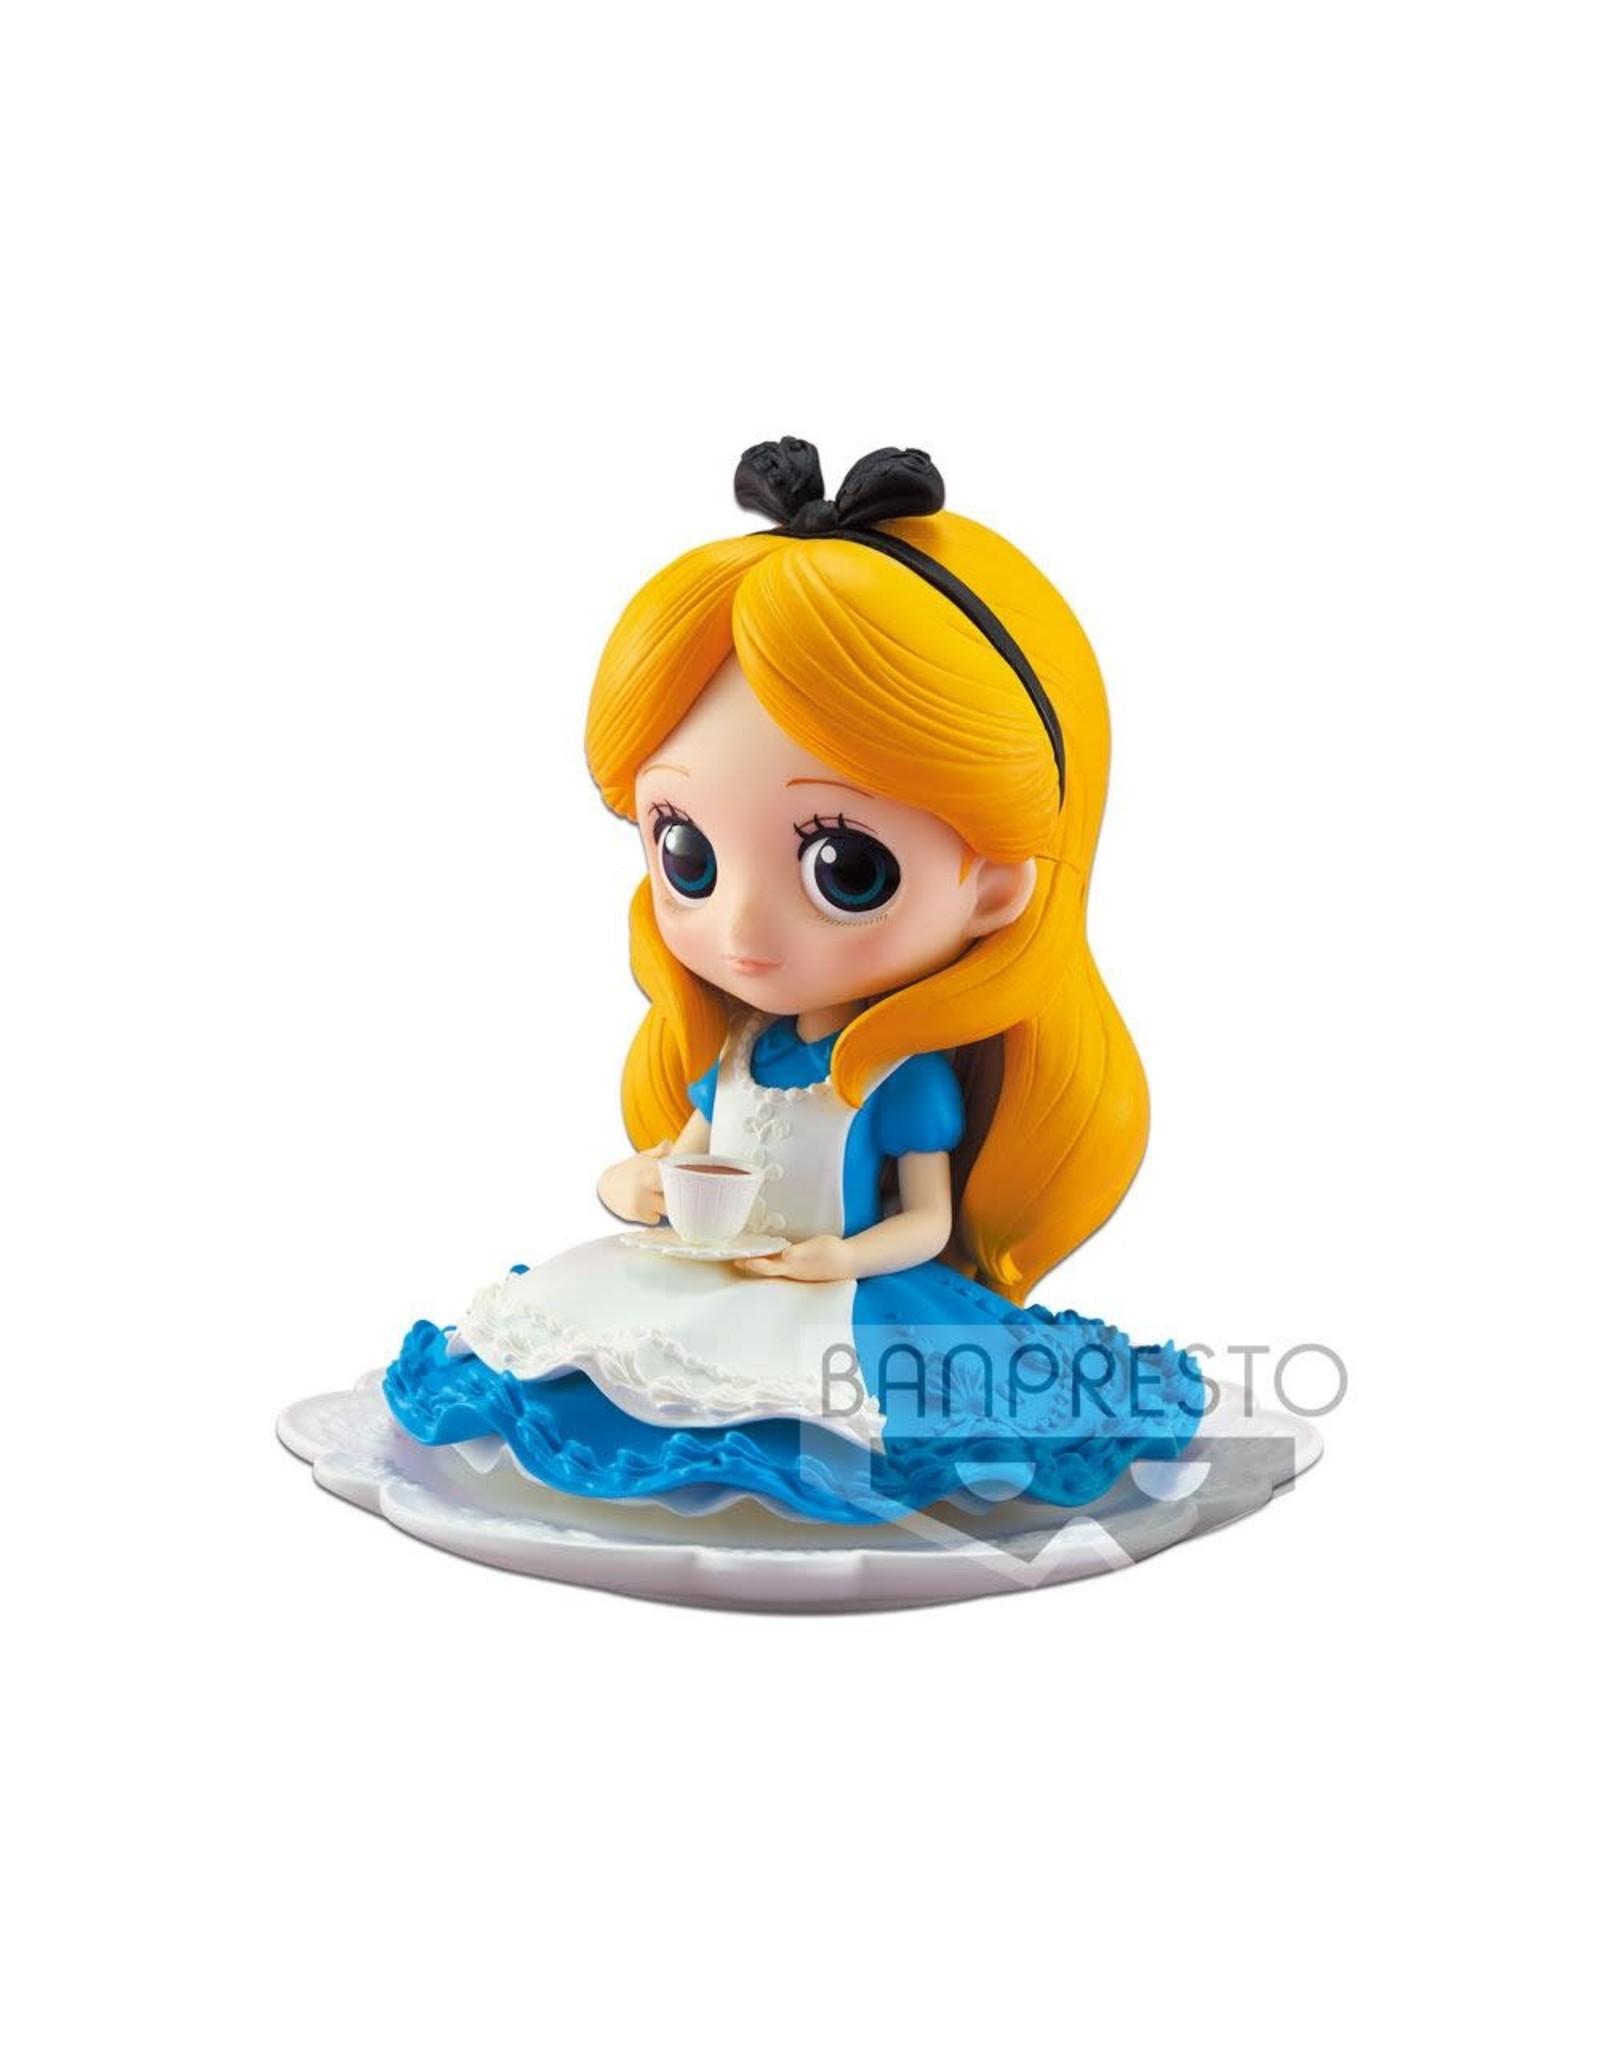 Banpresto ALICE Q Posket SUGIRLY 9cm - Alice Normal Color